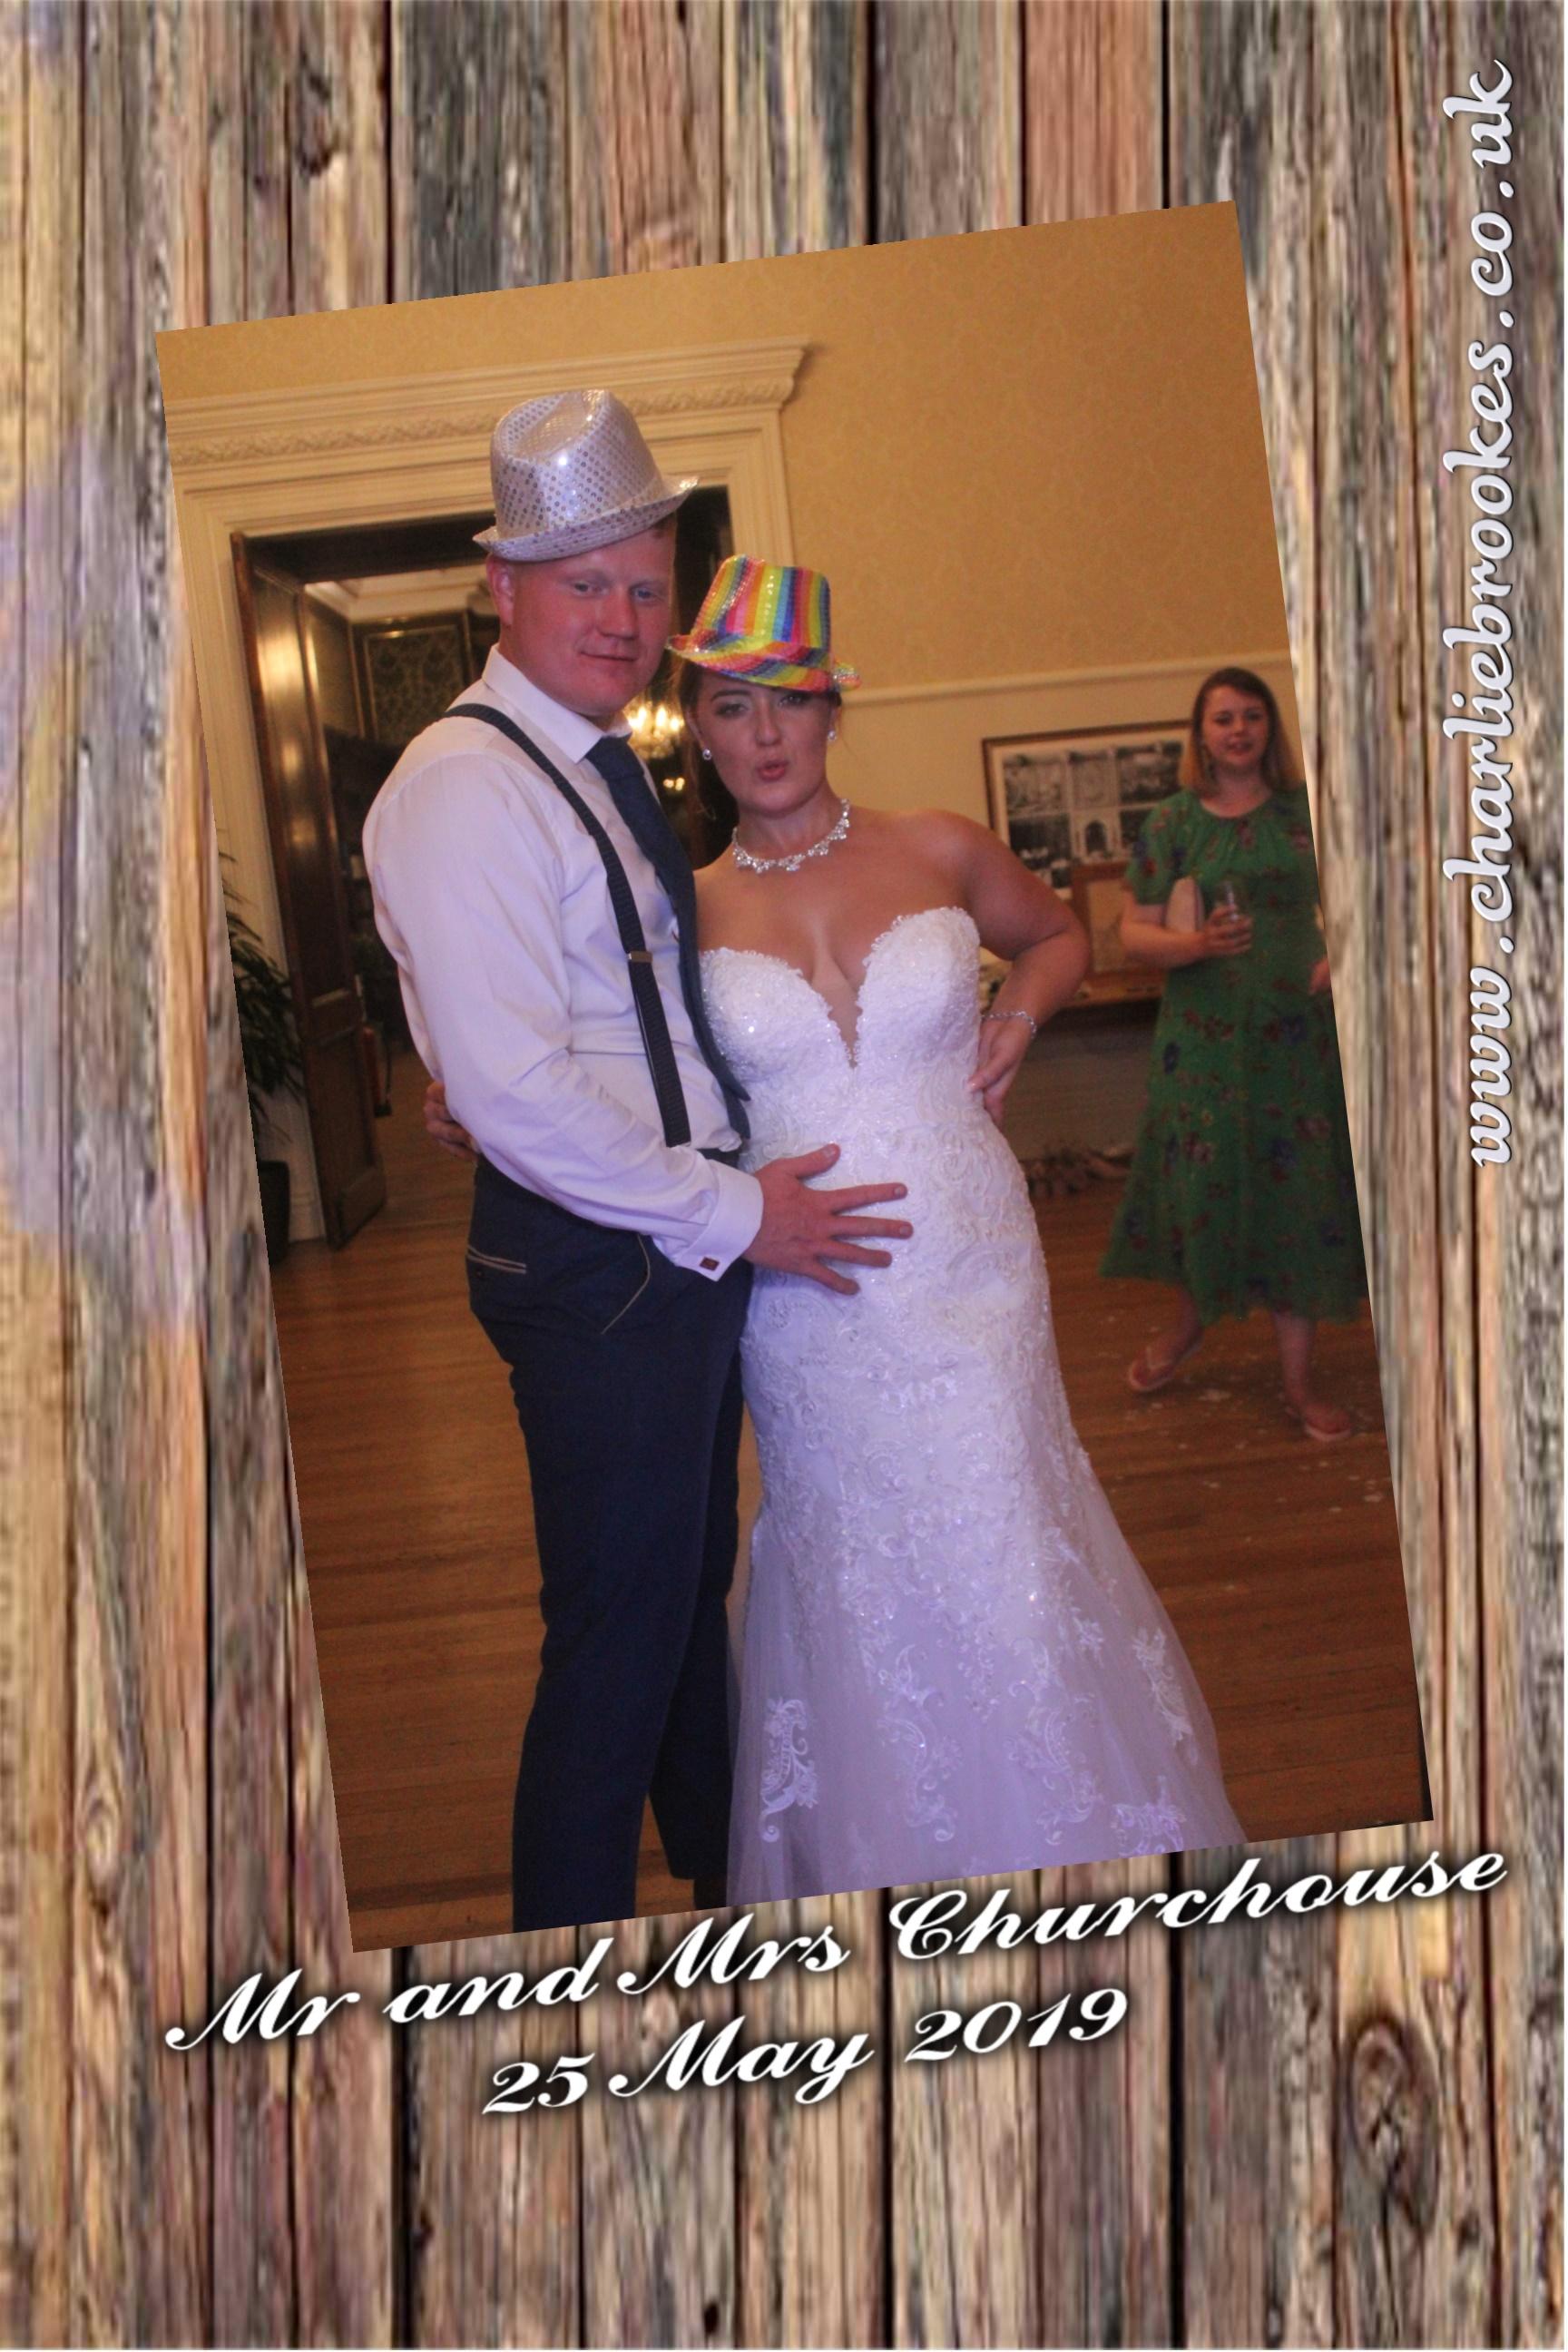 Wooden themed wedding template